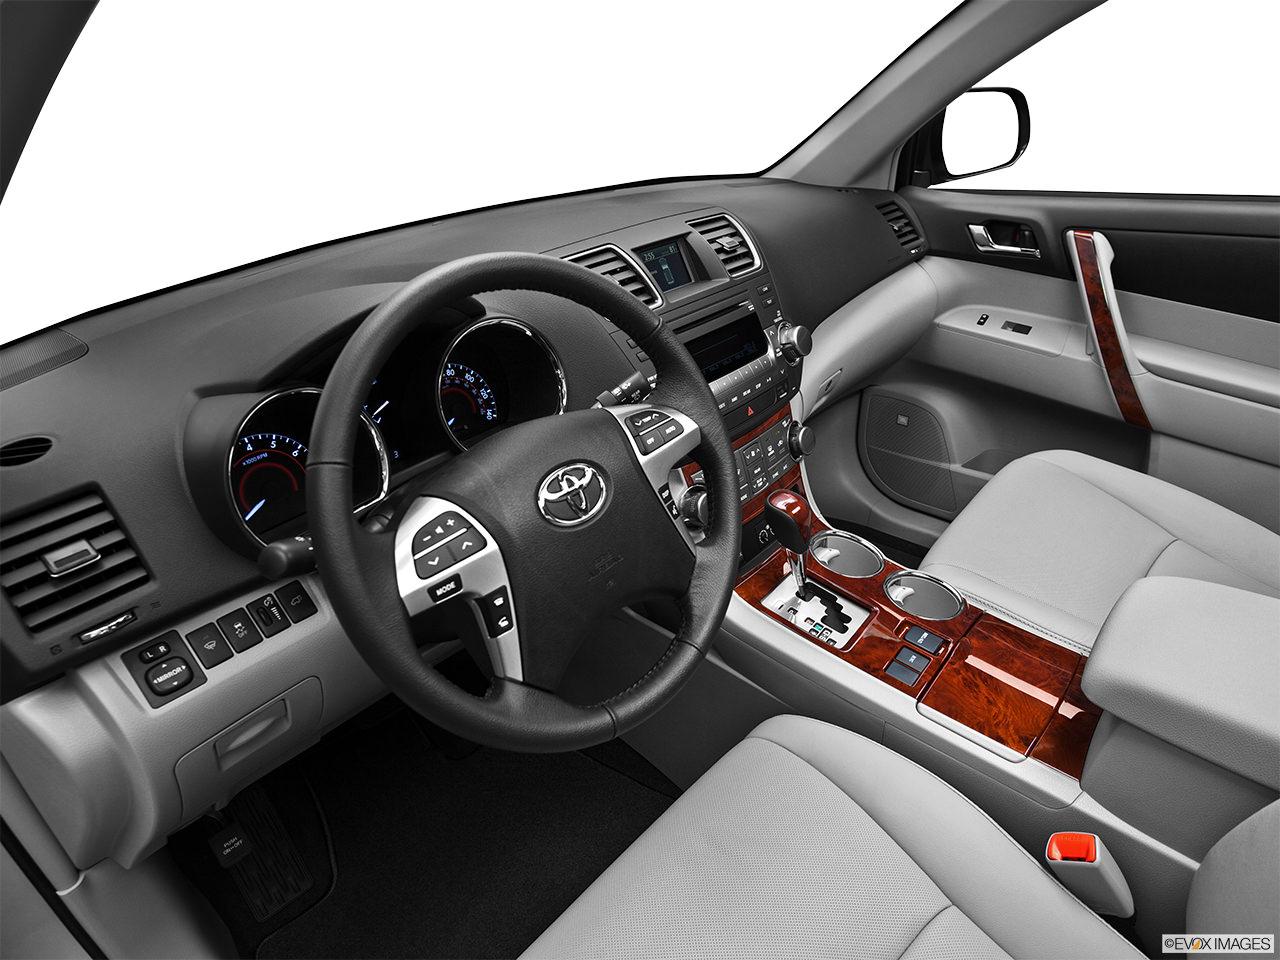 toyota highlander 2012 interior